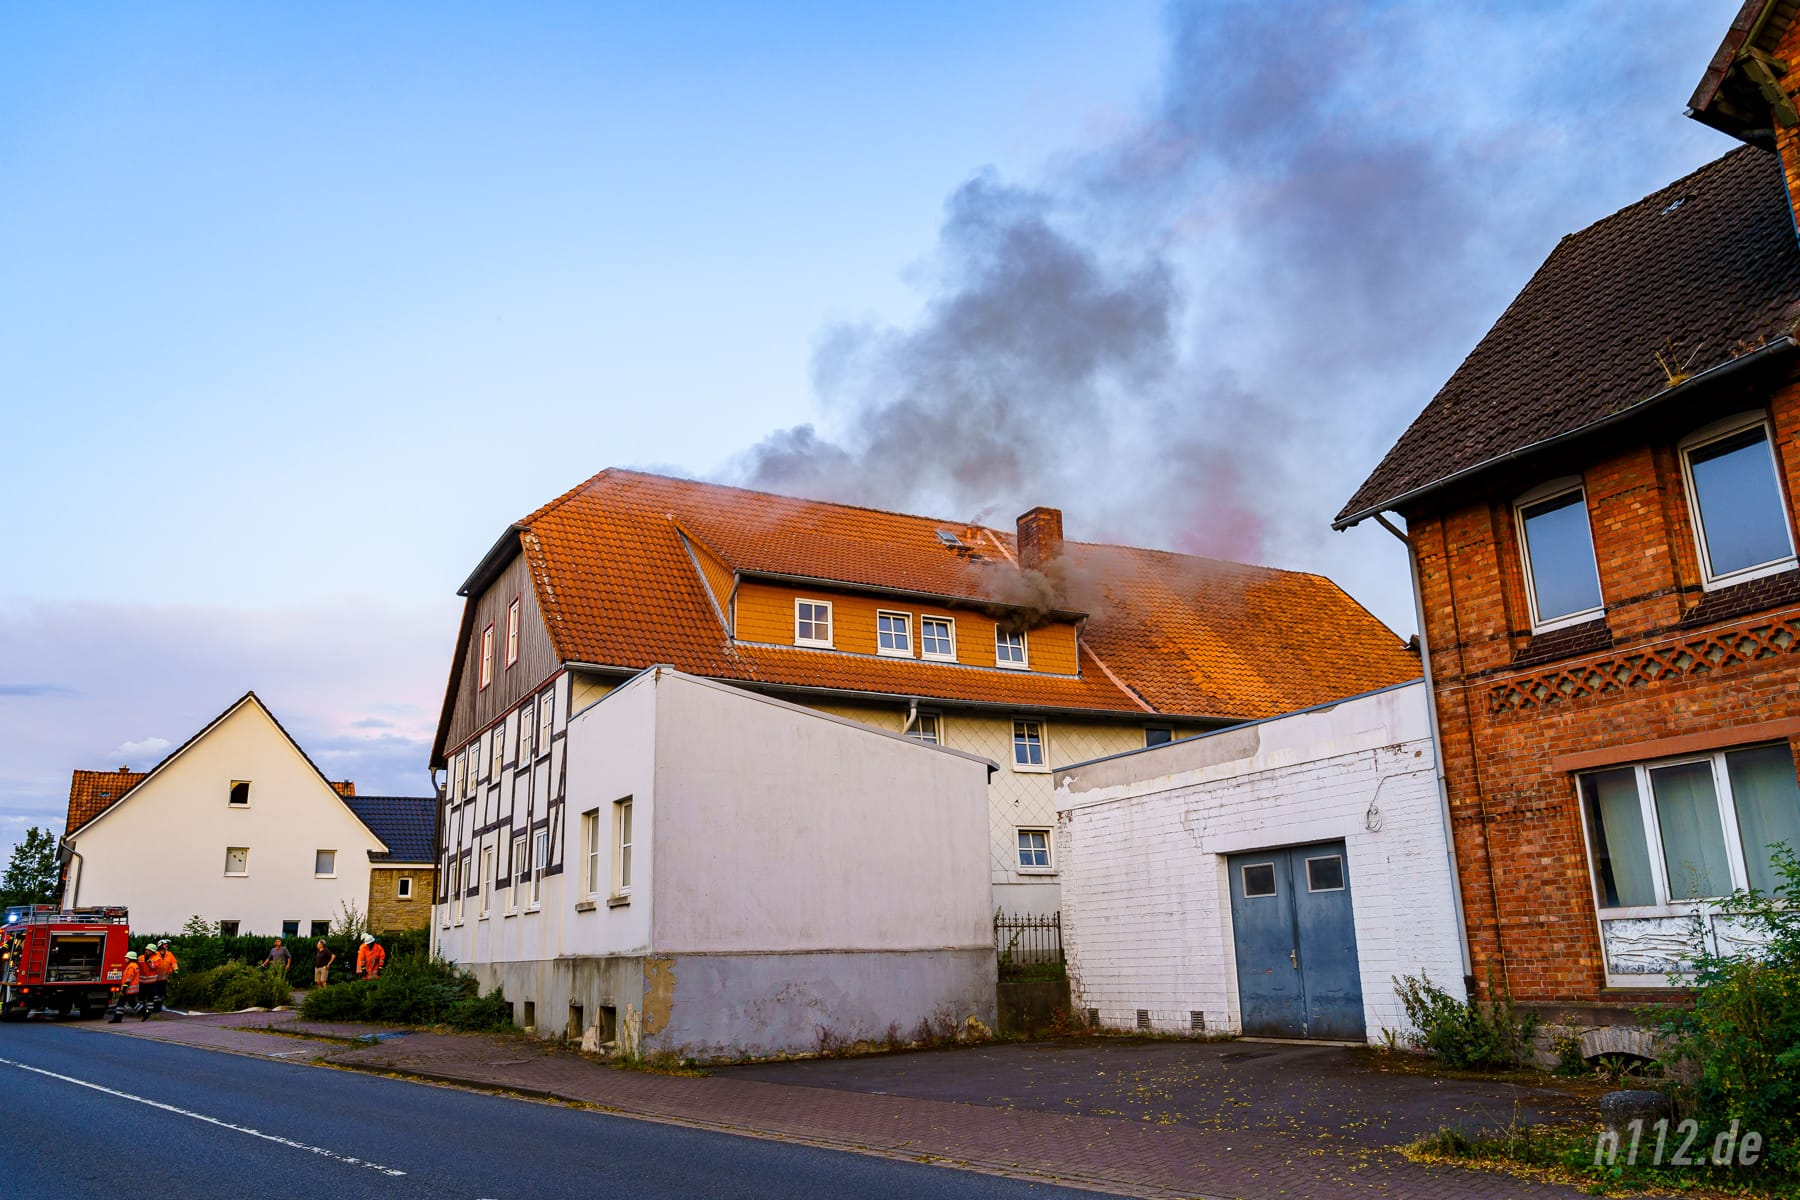 Beim Eintreffen der ersten Feuerwehrleute drang schwarzer Rauch aus dem Dachgeschoss (Foto: n112.de/Stefan Simonsen)